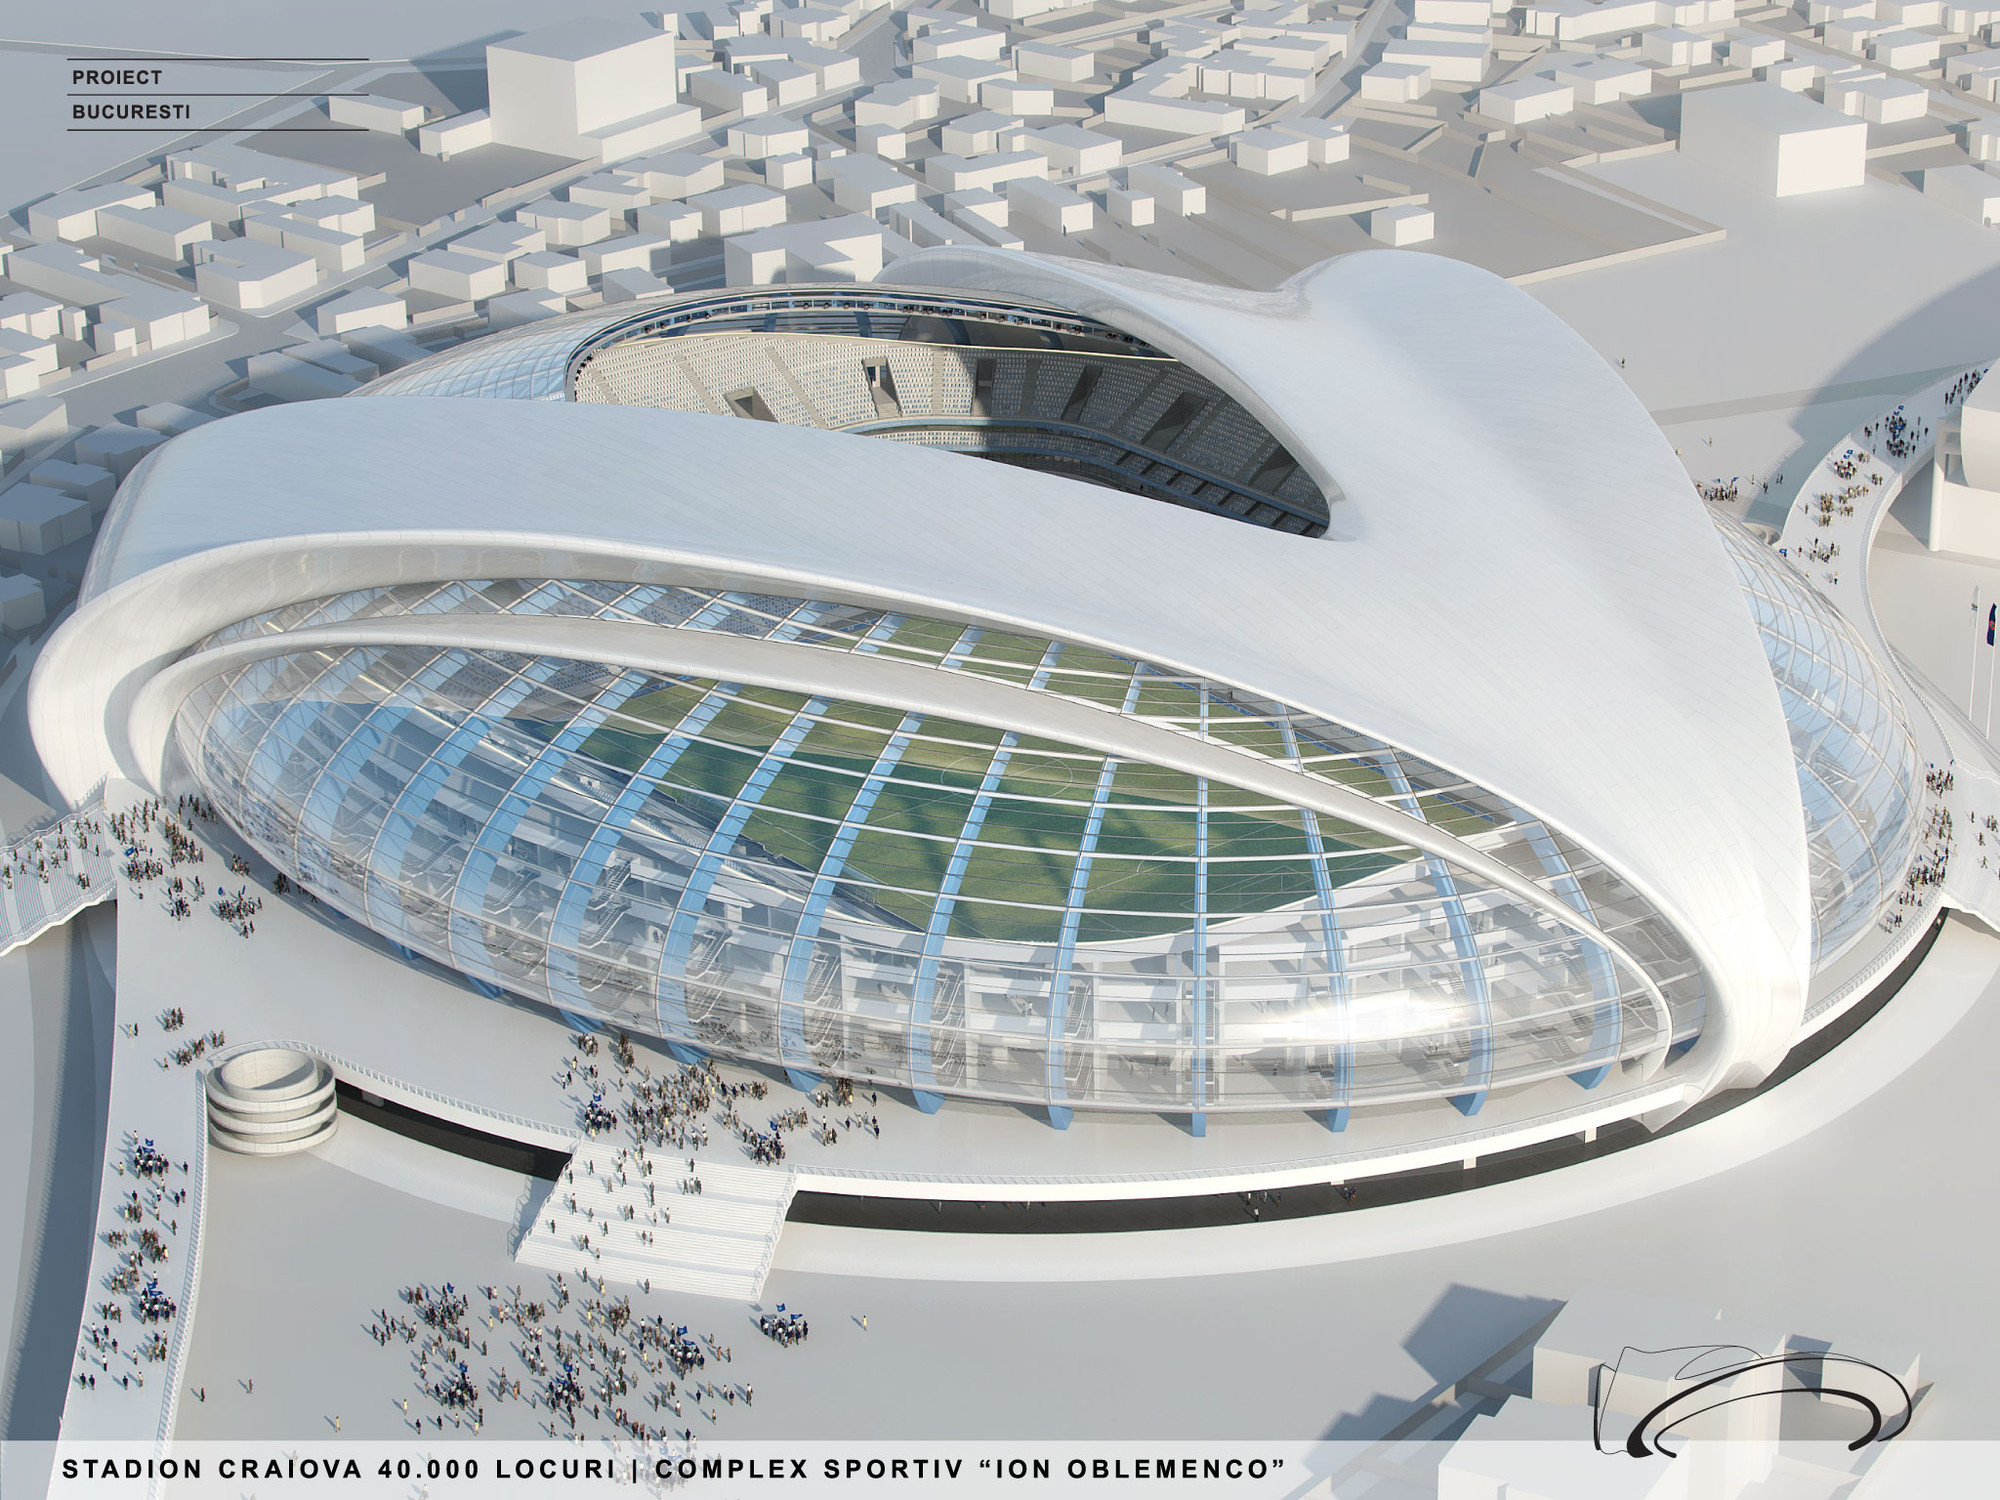 Craiova Football Stadium Proposal Proiect Bucuresti Archdaily